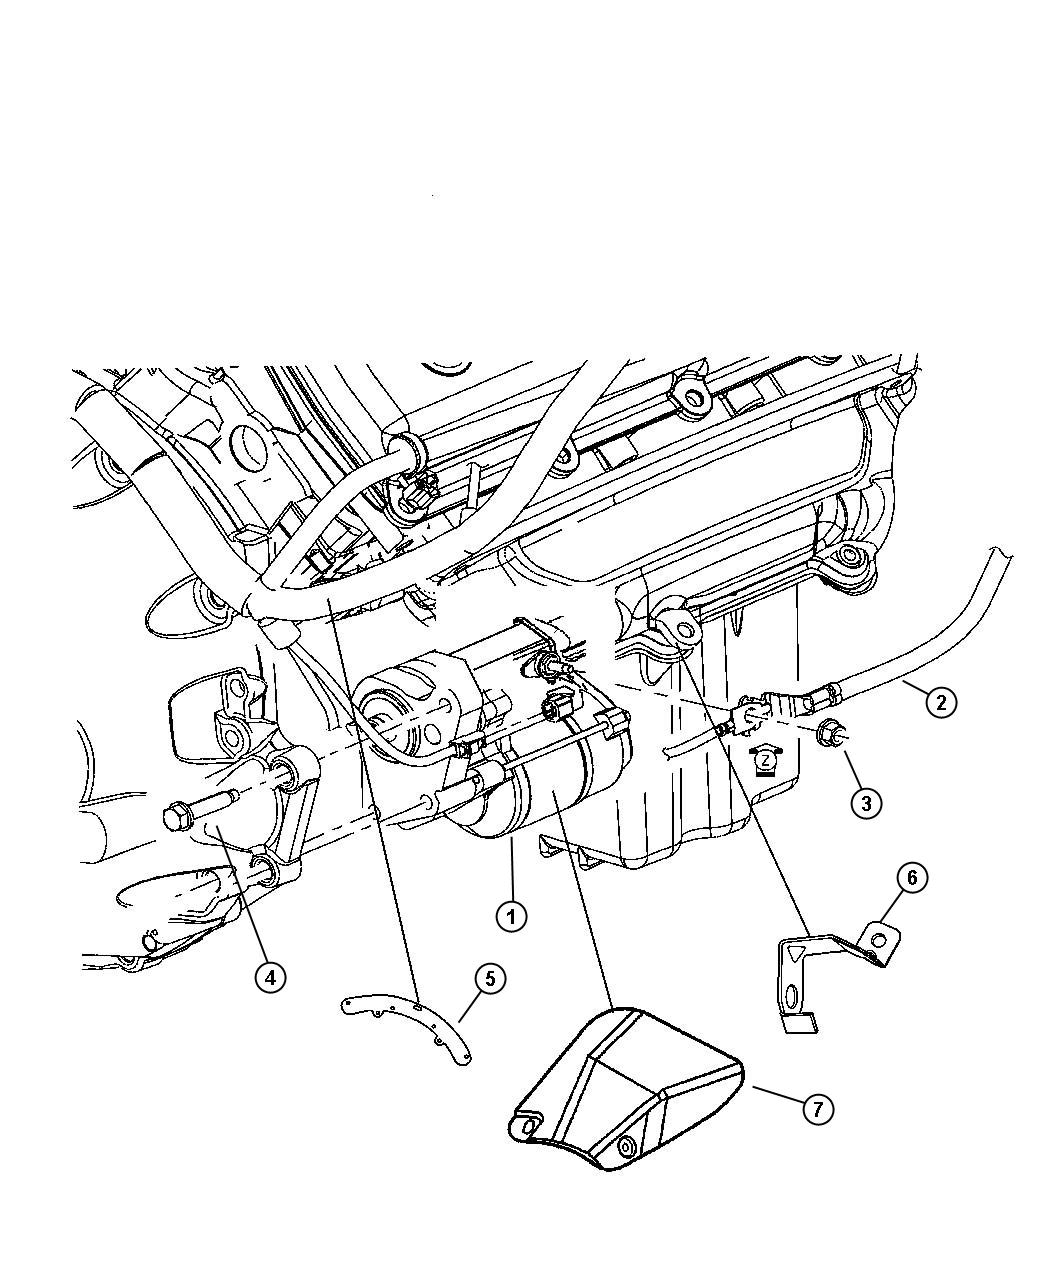 Doc Diagram Motors By Jules Bartow Goldvein Power